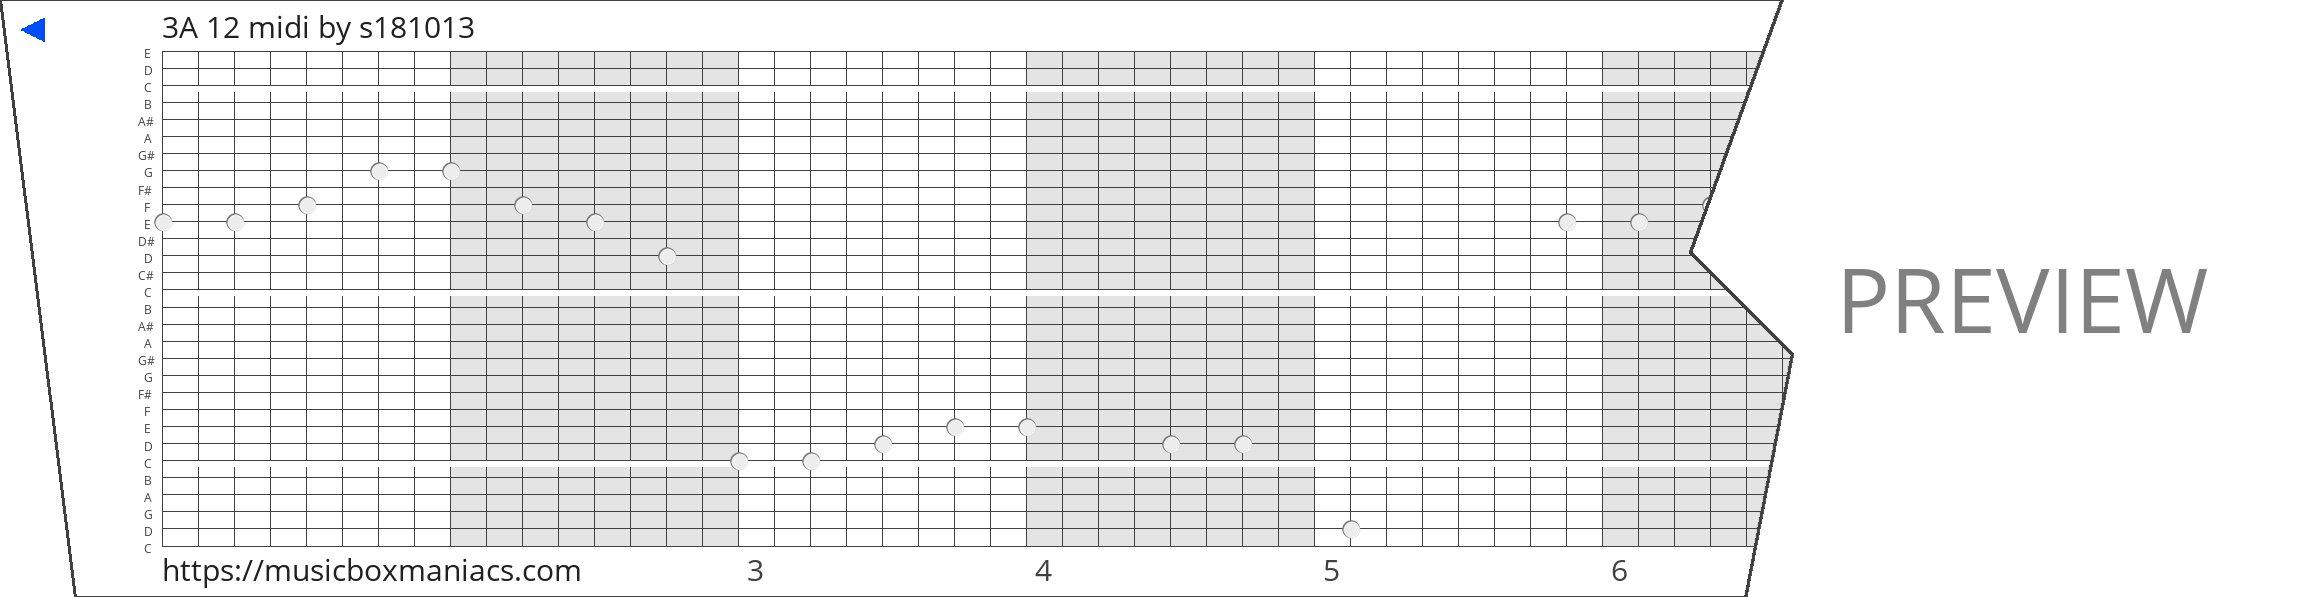 3A 12 midi 30 note music box paper strip